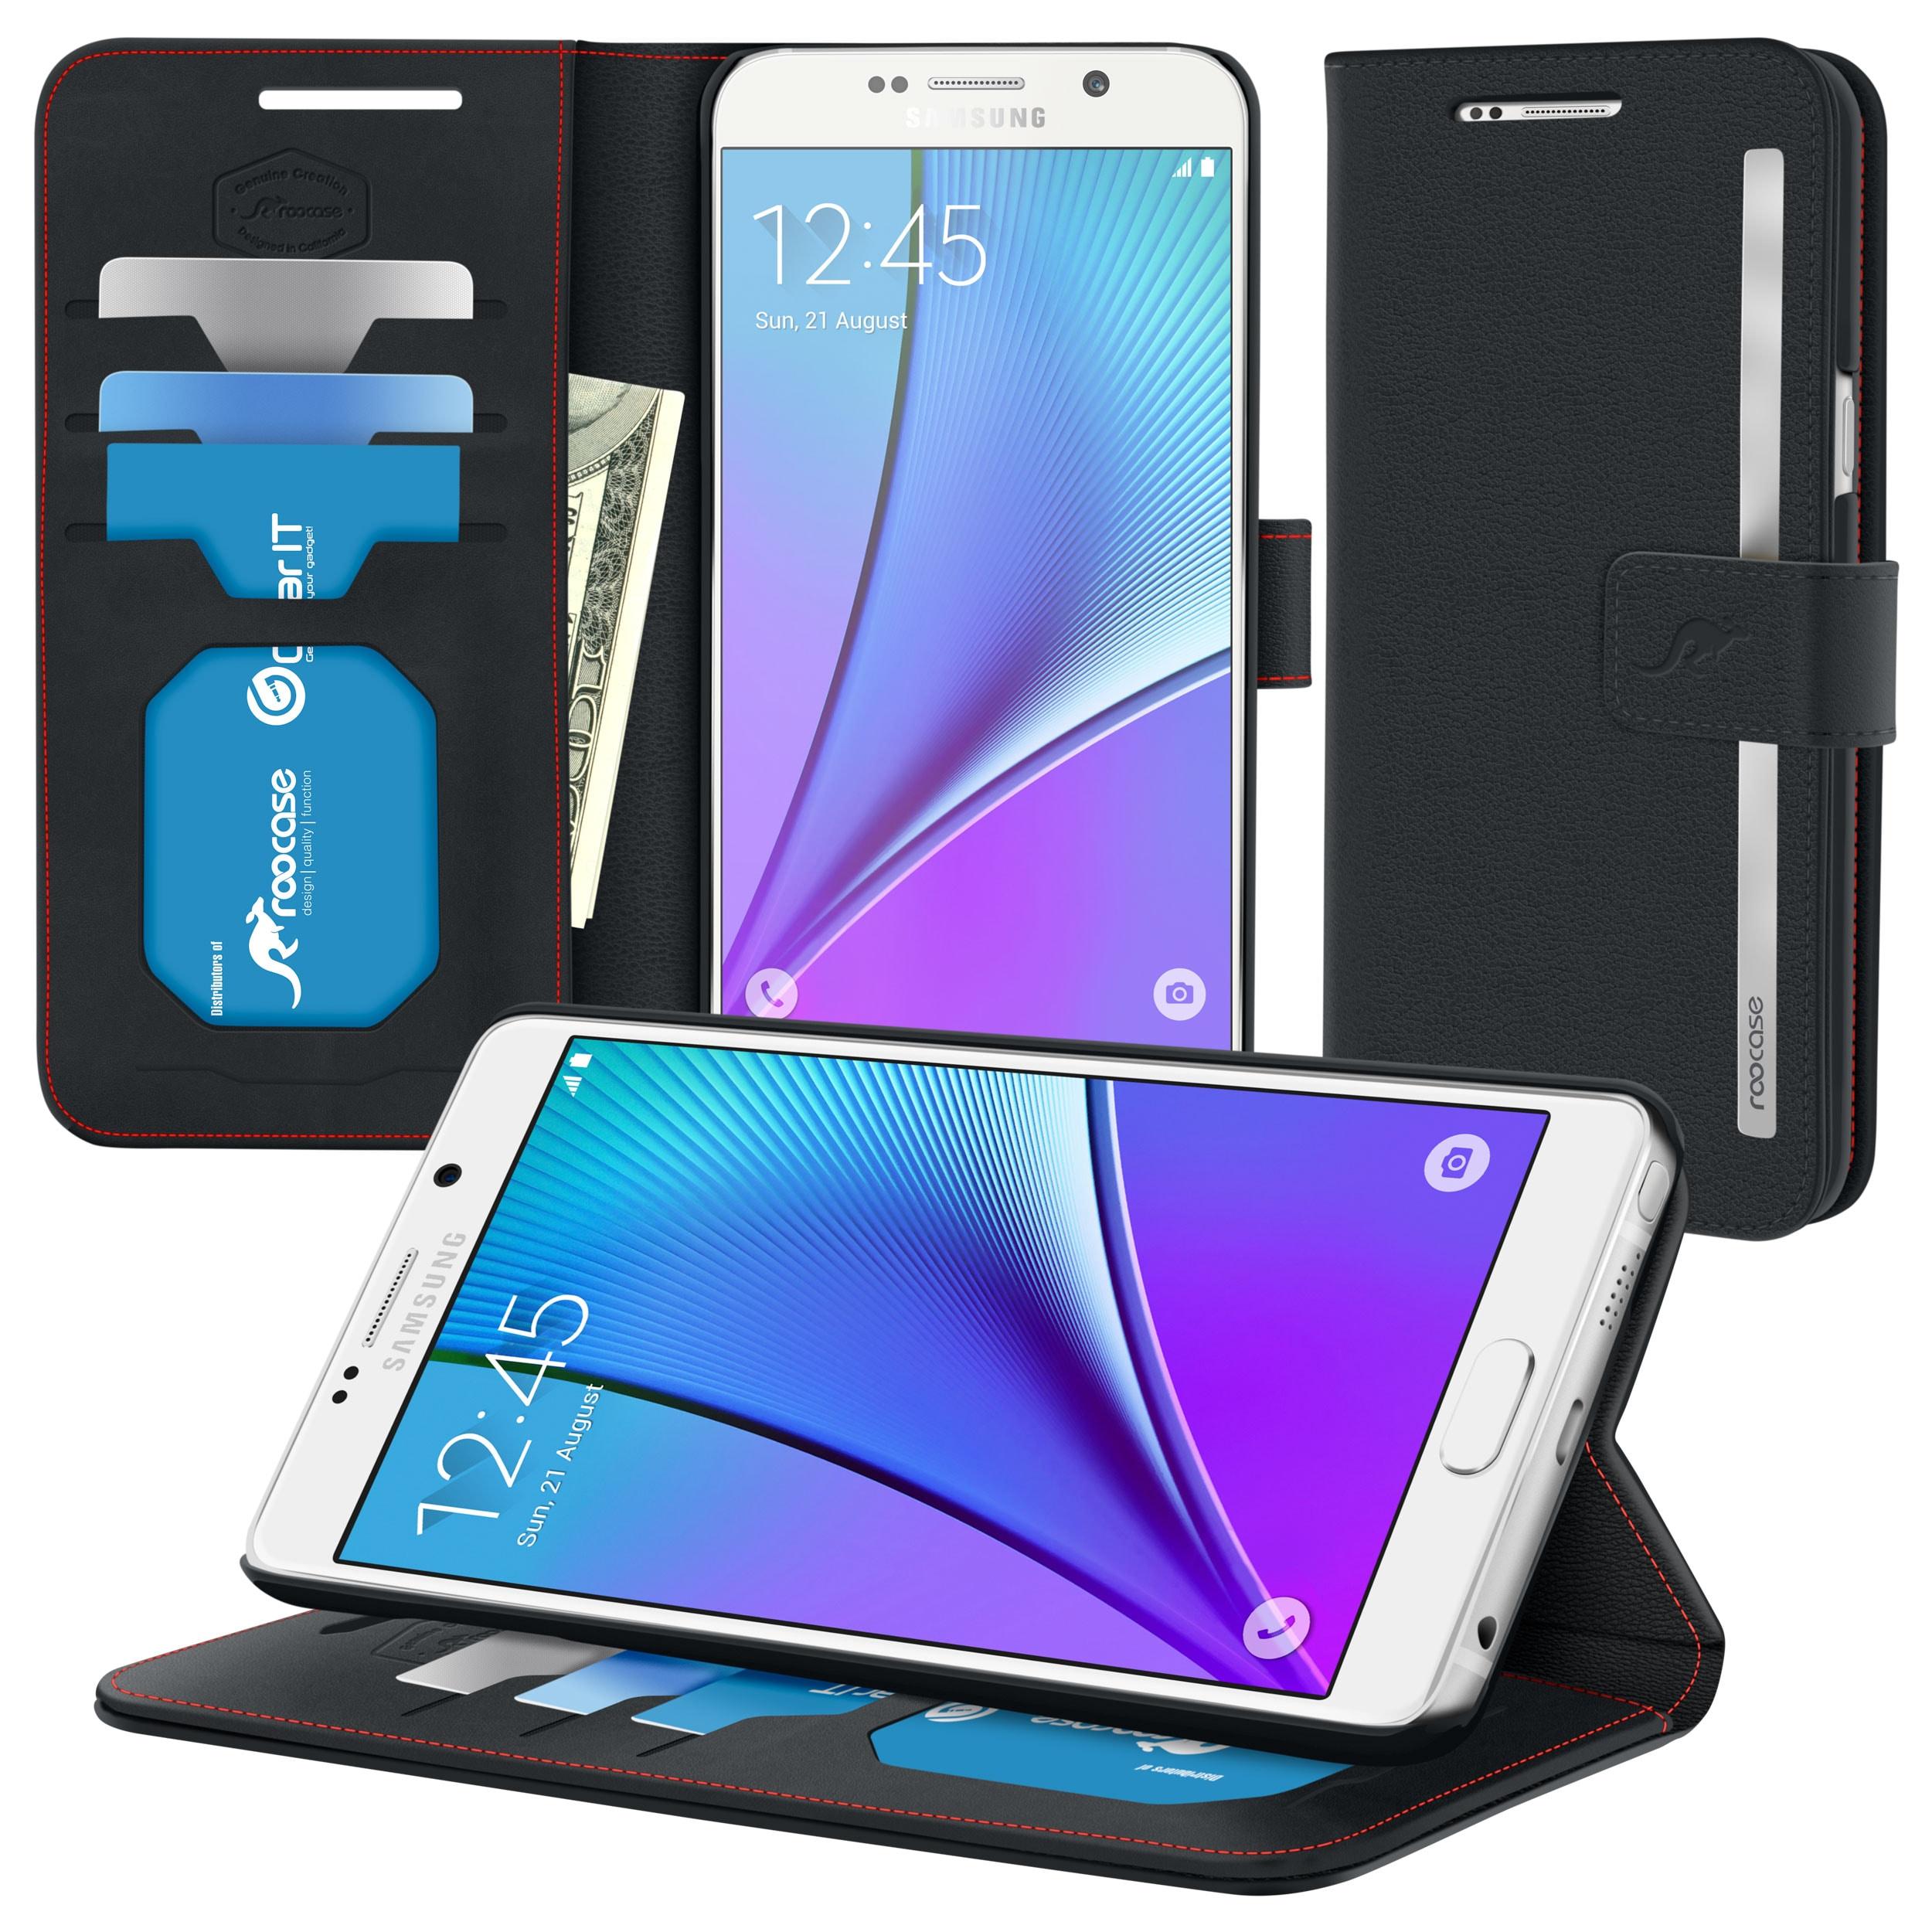 roocase Prestige Folio Case for Samsung Galaxy Note5